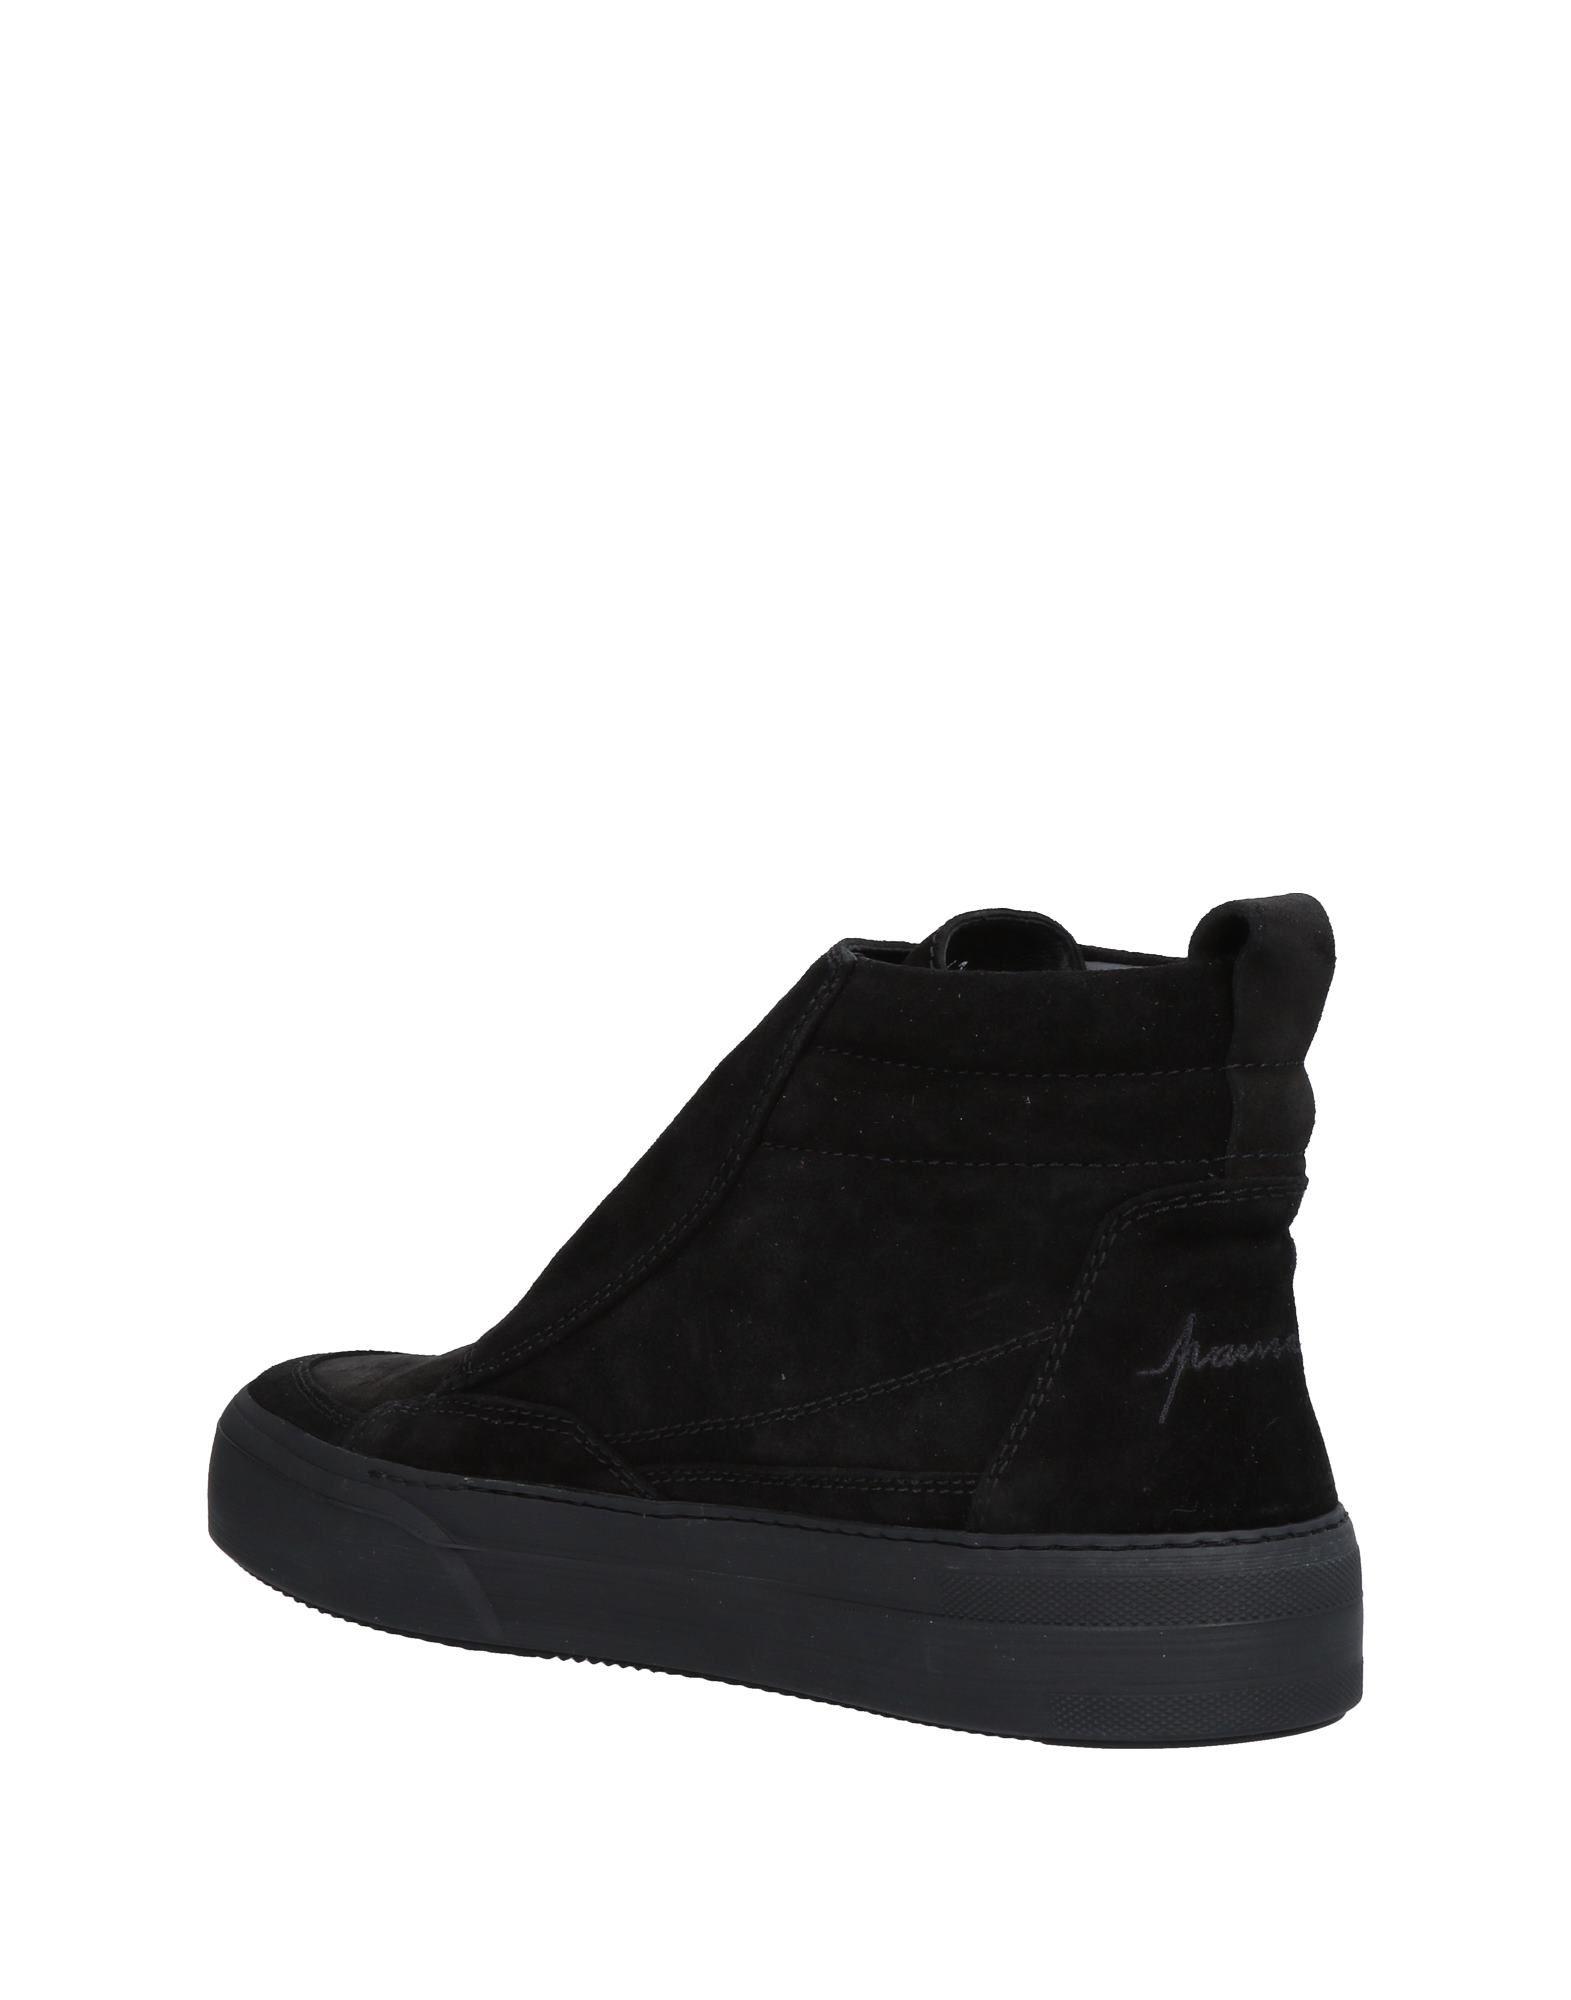 Rabatt echte  Schuhe Paura Sneakers Herren  echte 11475722AE 1f1144